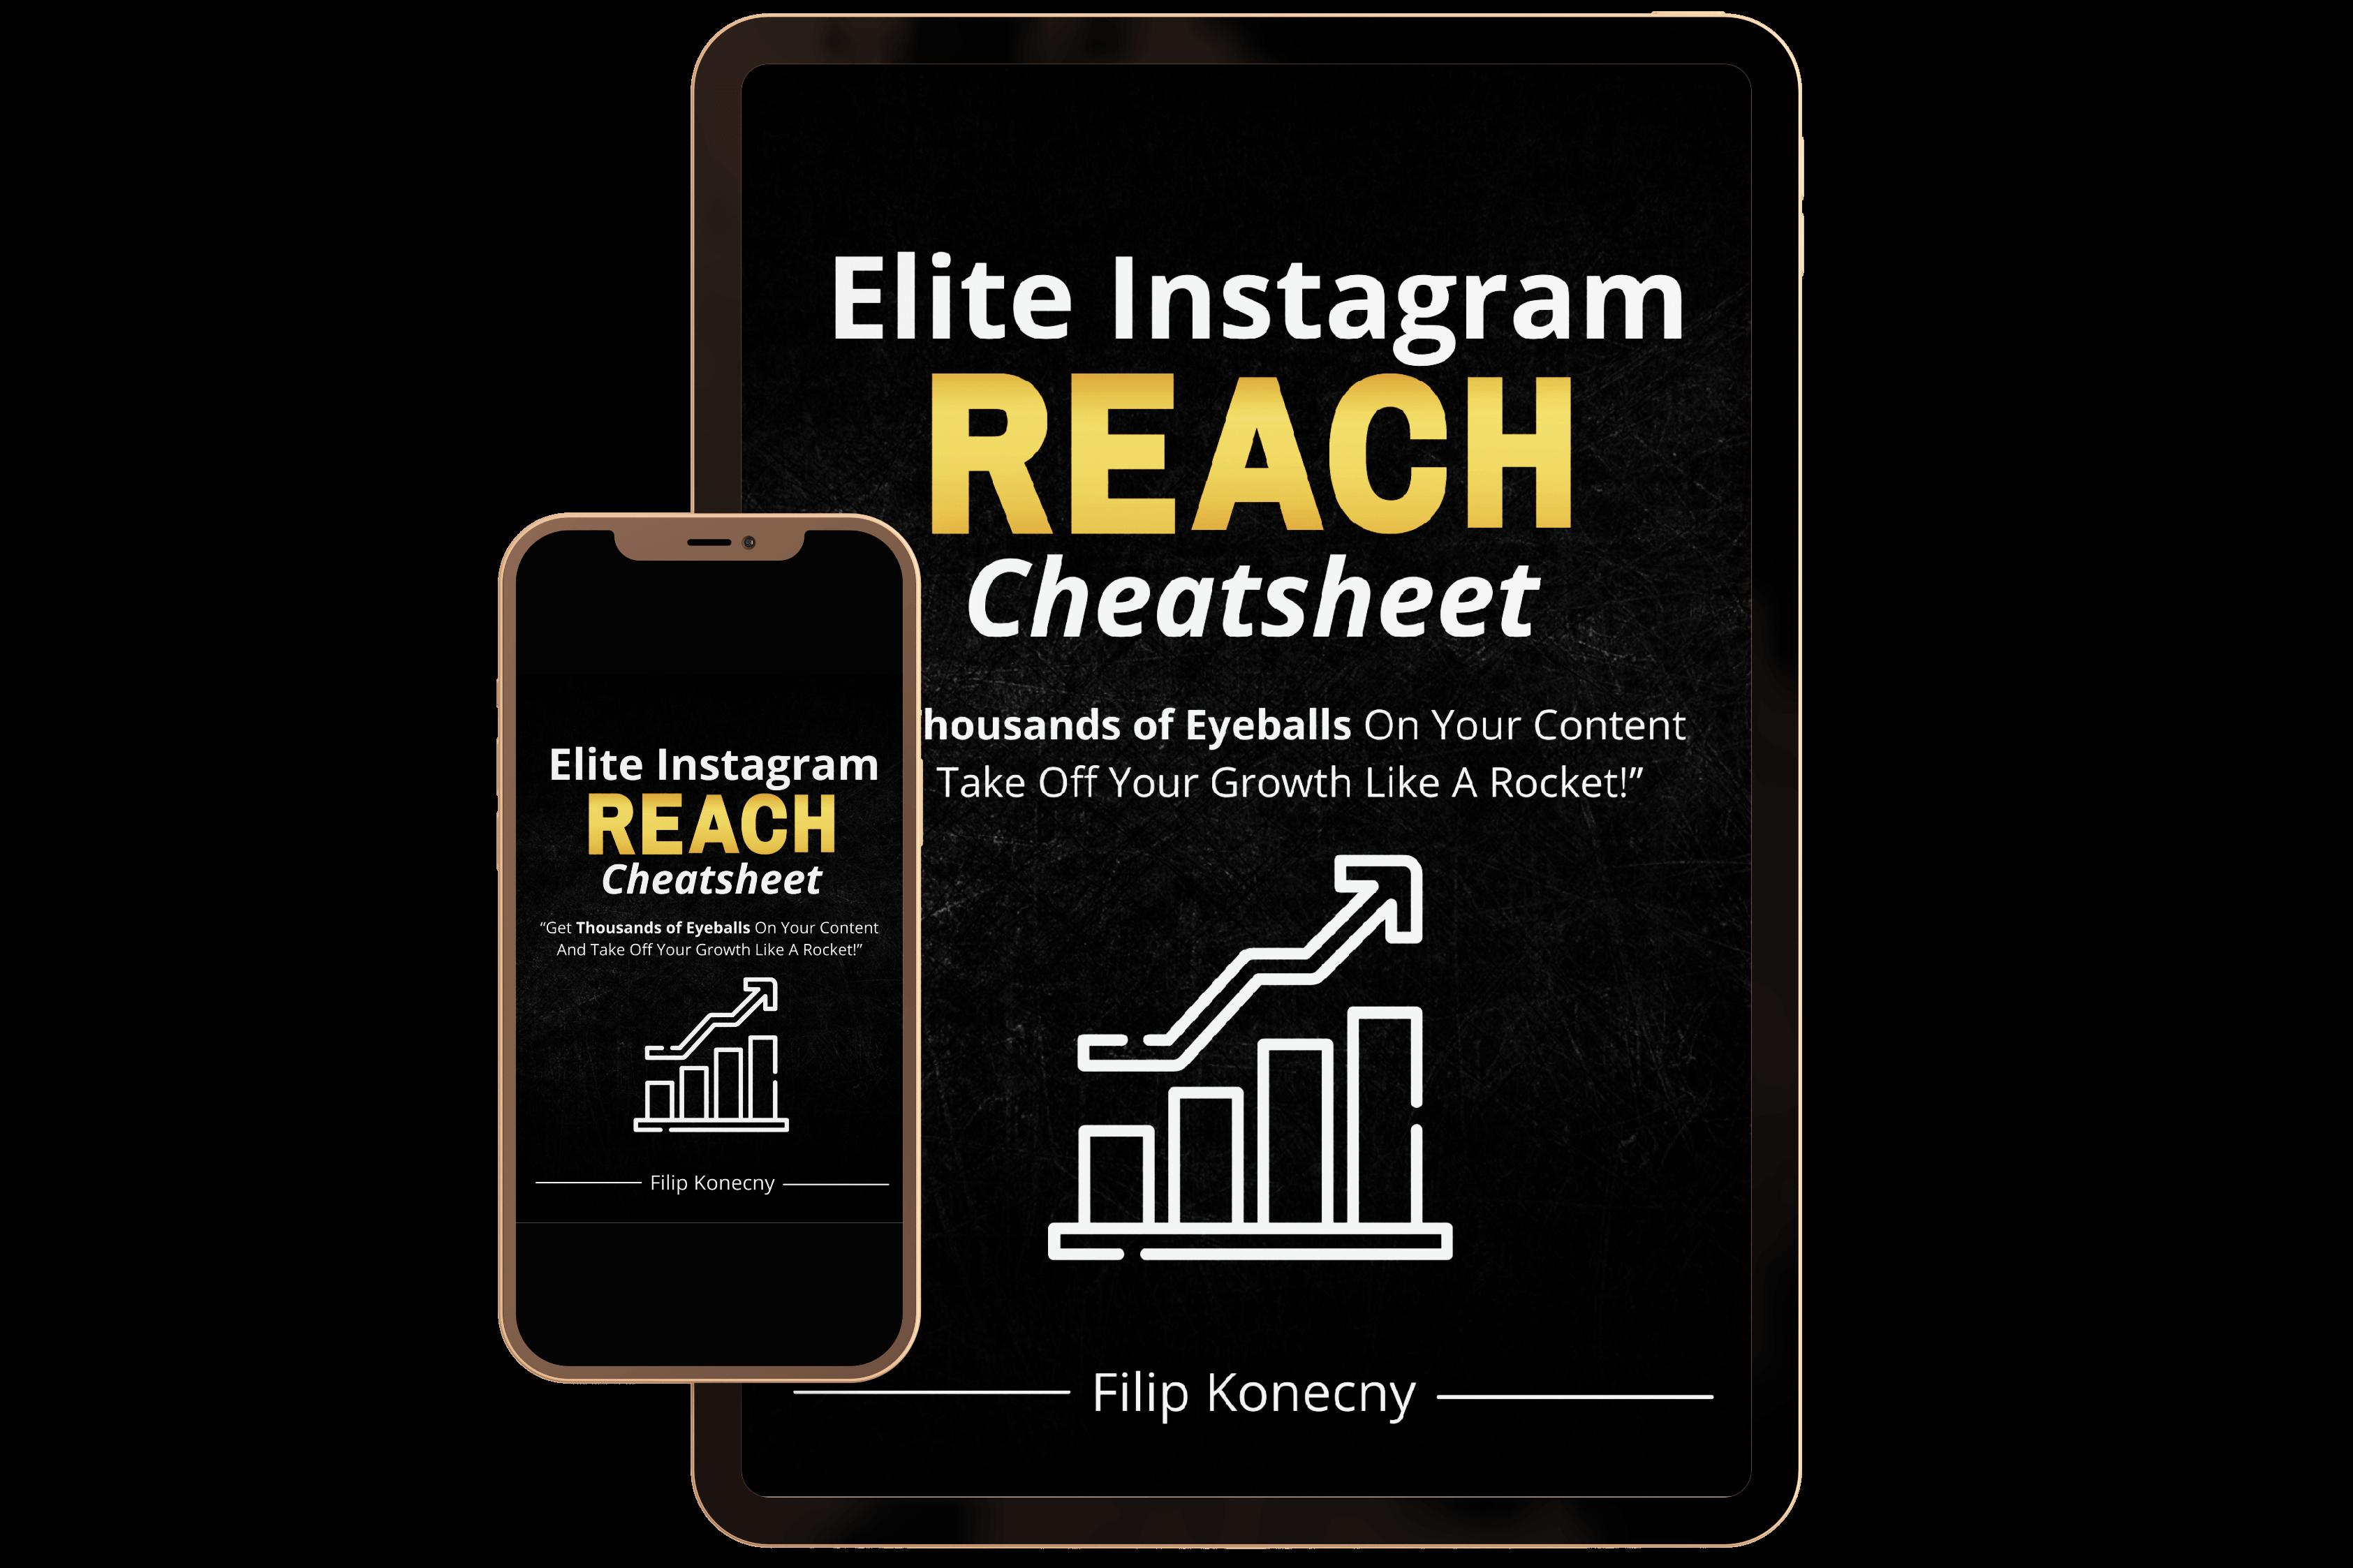 Elite Instagram Reach Cheatsheet E-book